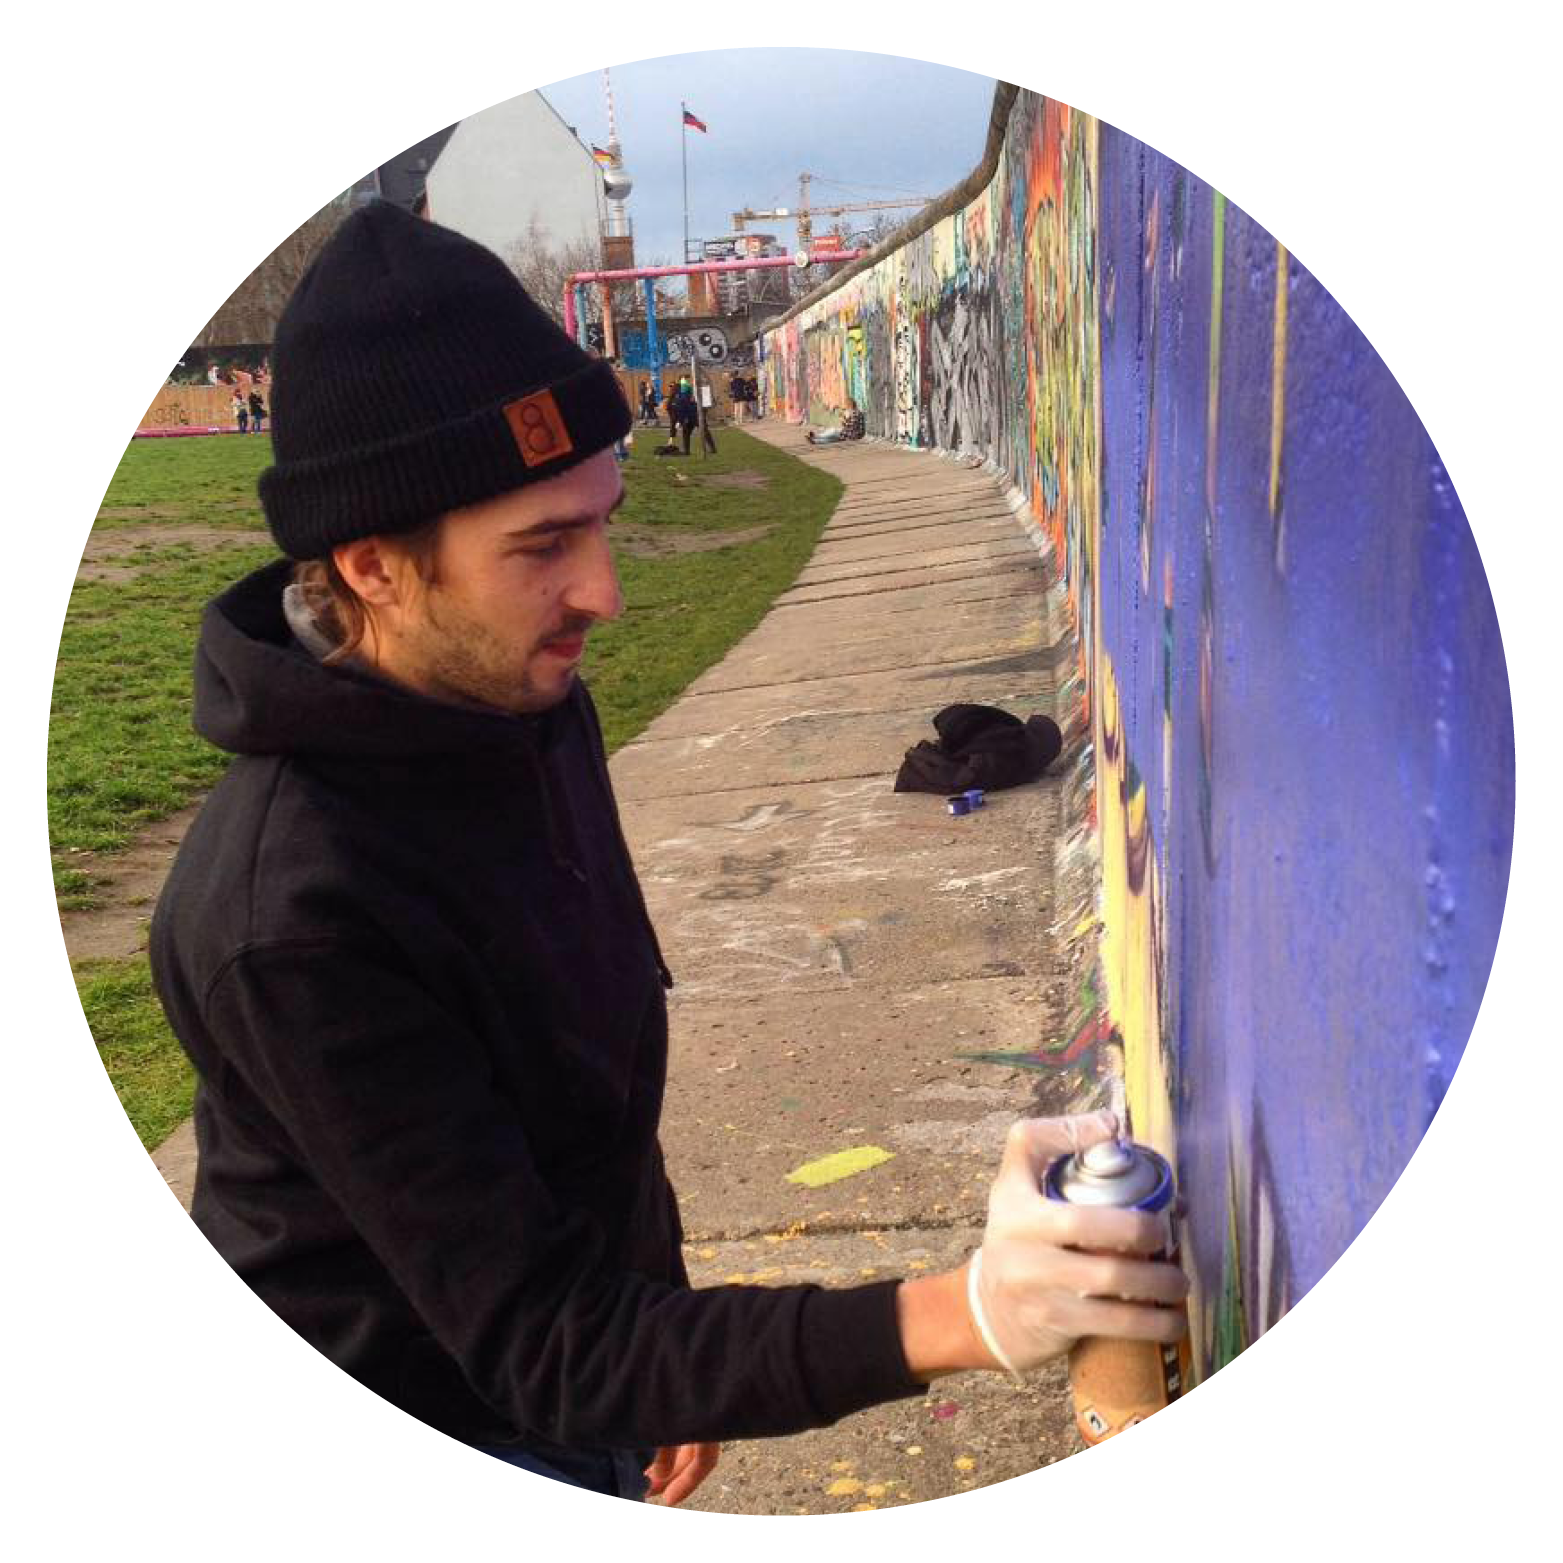 Artiste graffeur professionnel